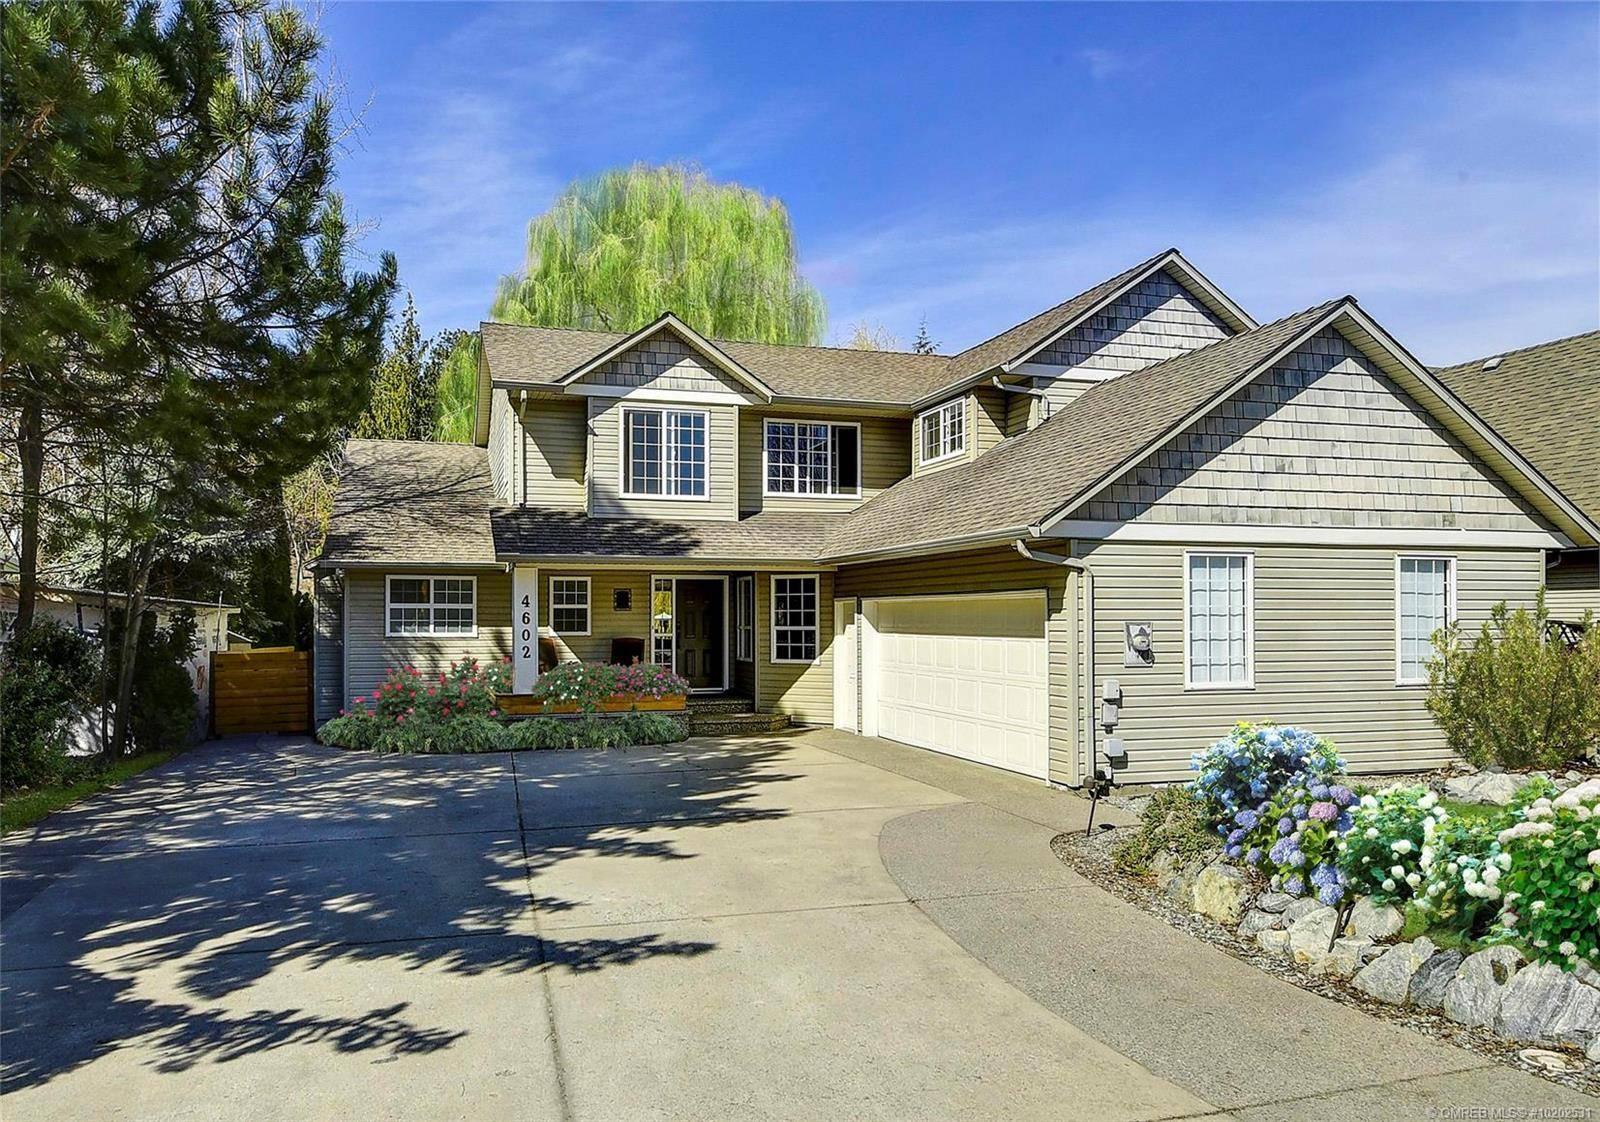 House for sale at 4602 Mcclure Rd Kelowna British Columbia - MLS: 10202531